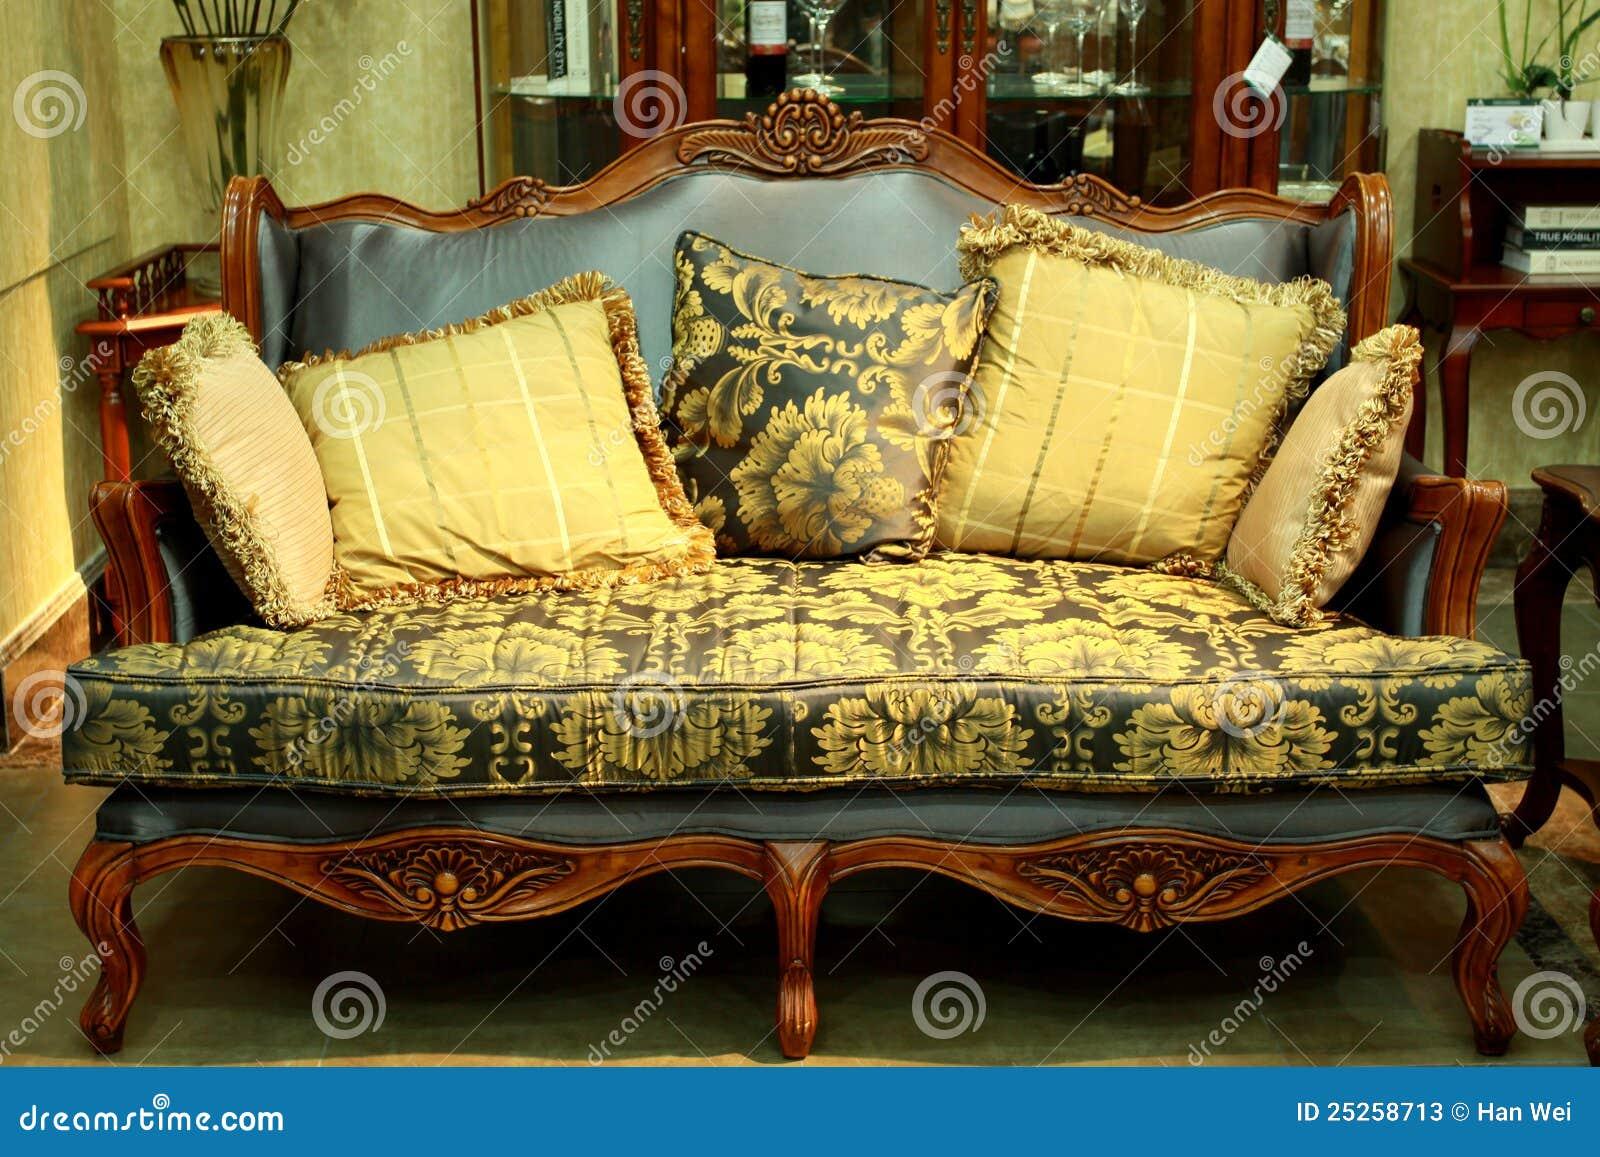 Luxury Furniture Stock s Image